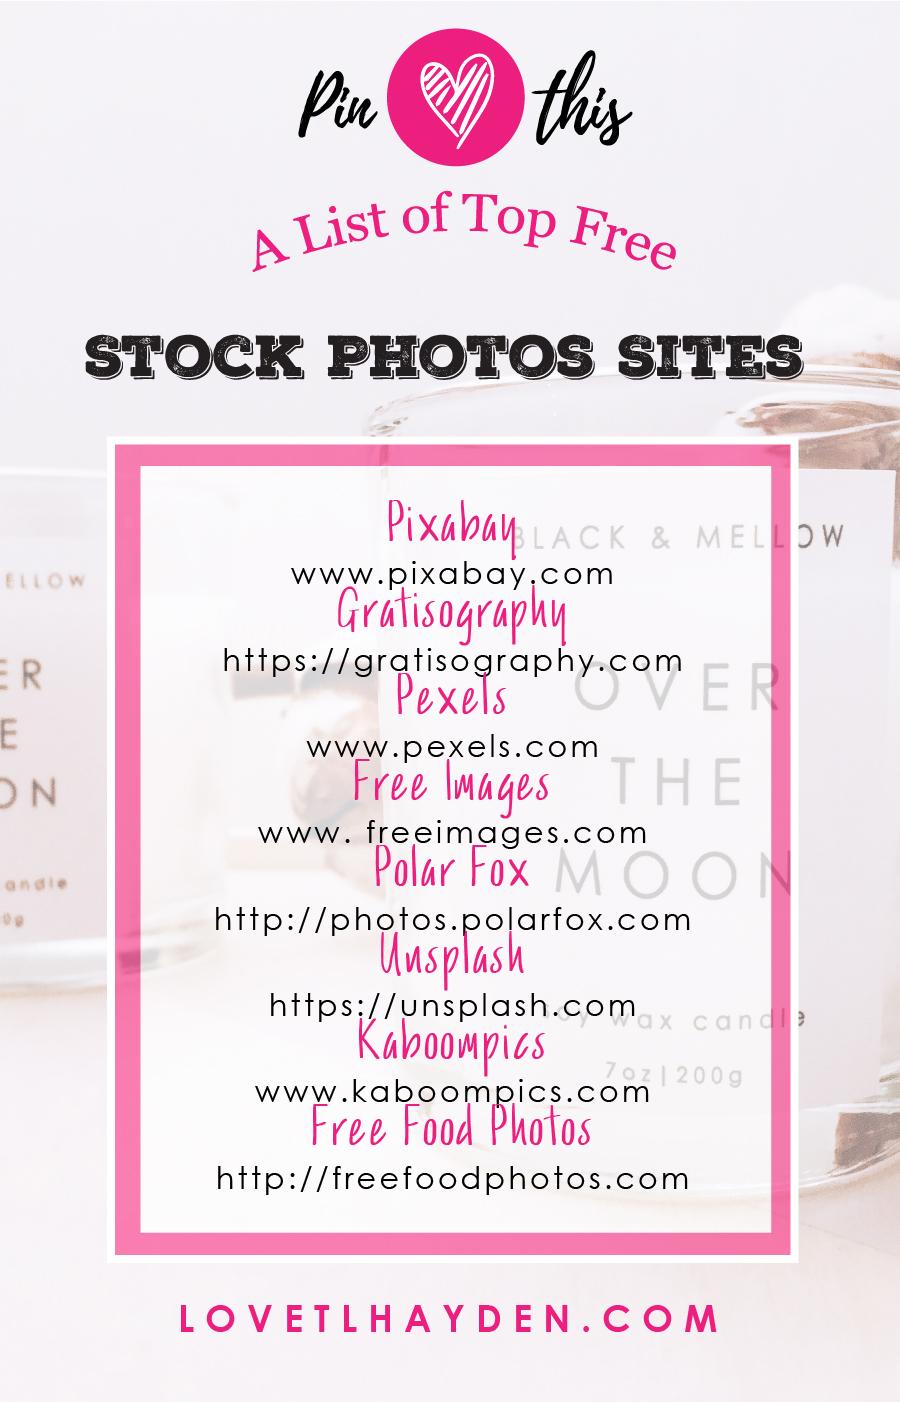 stockphotosites.jpg